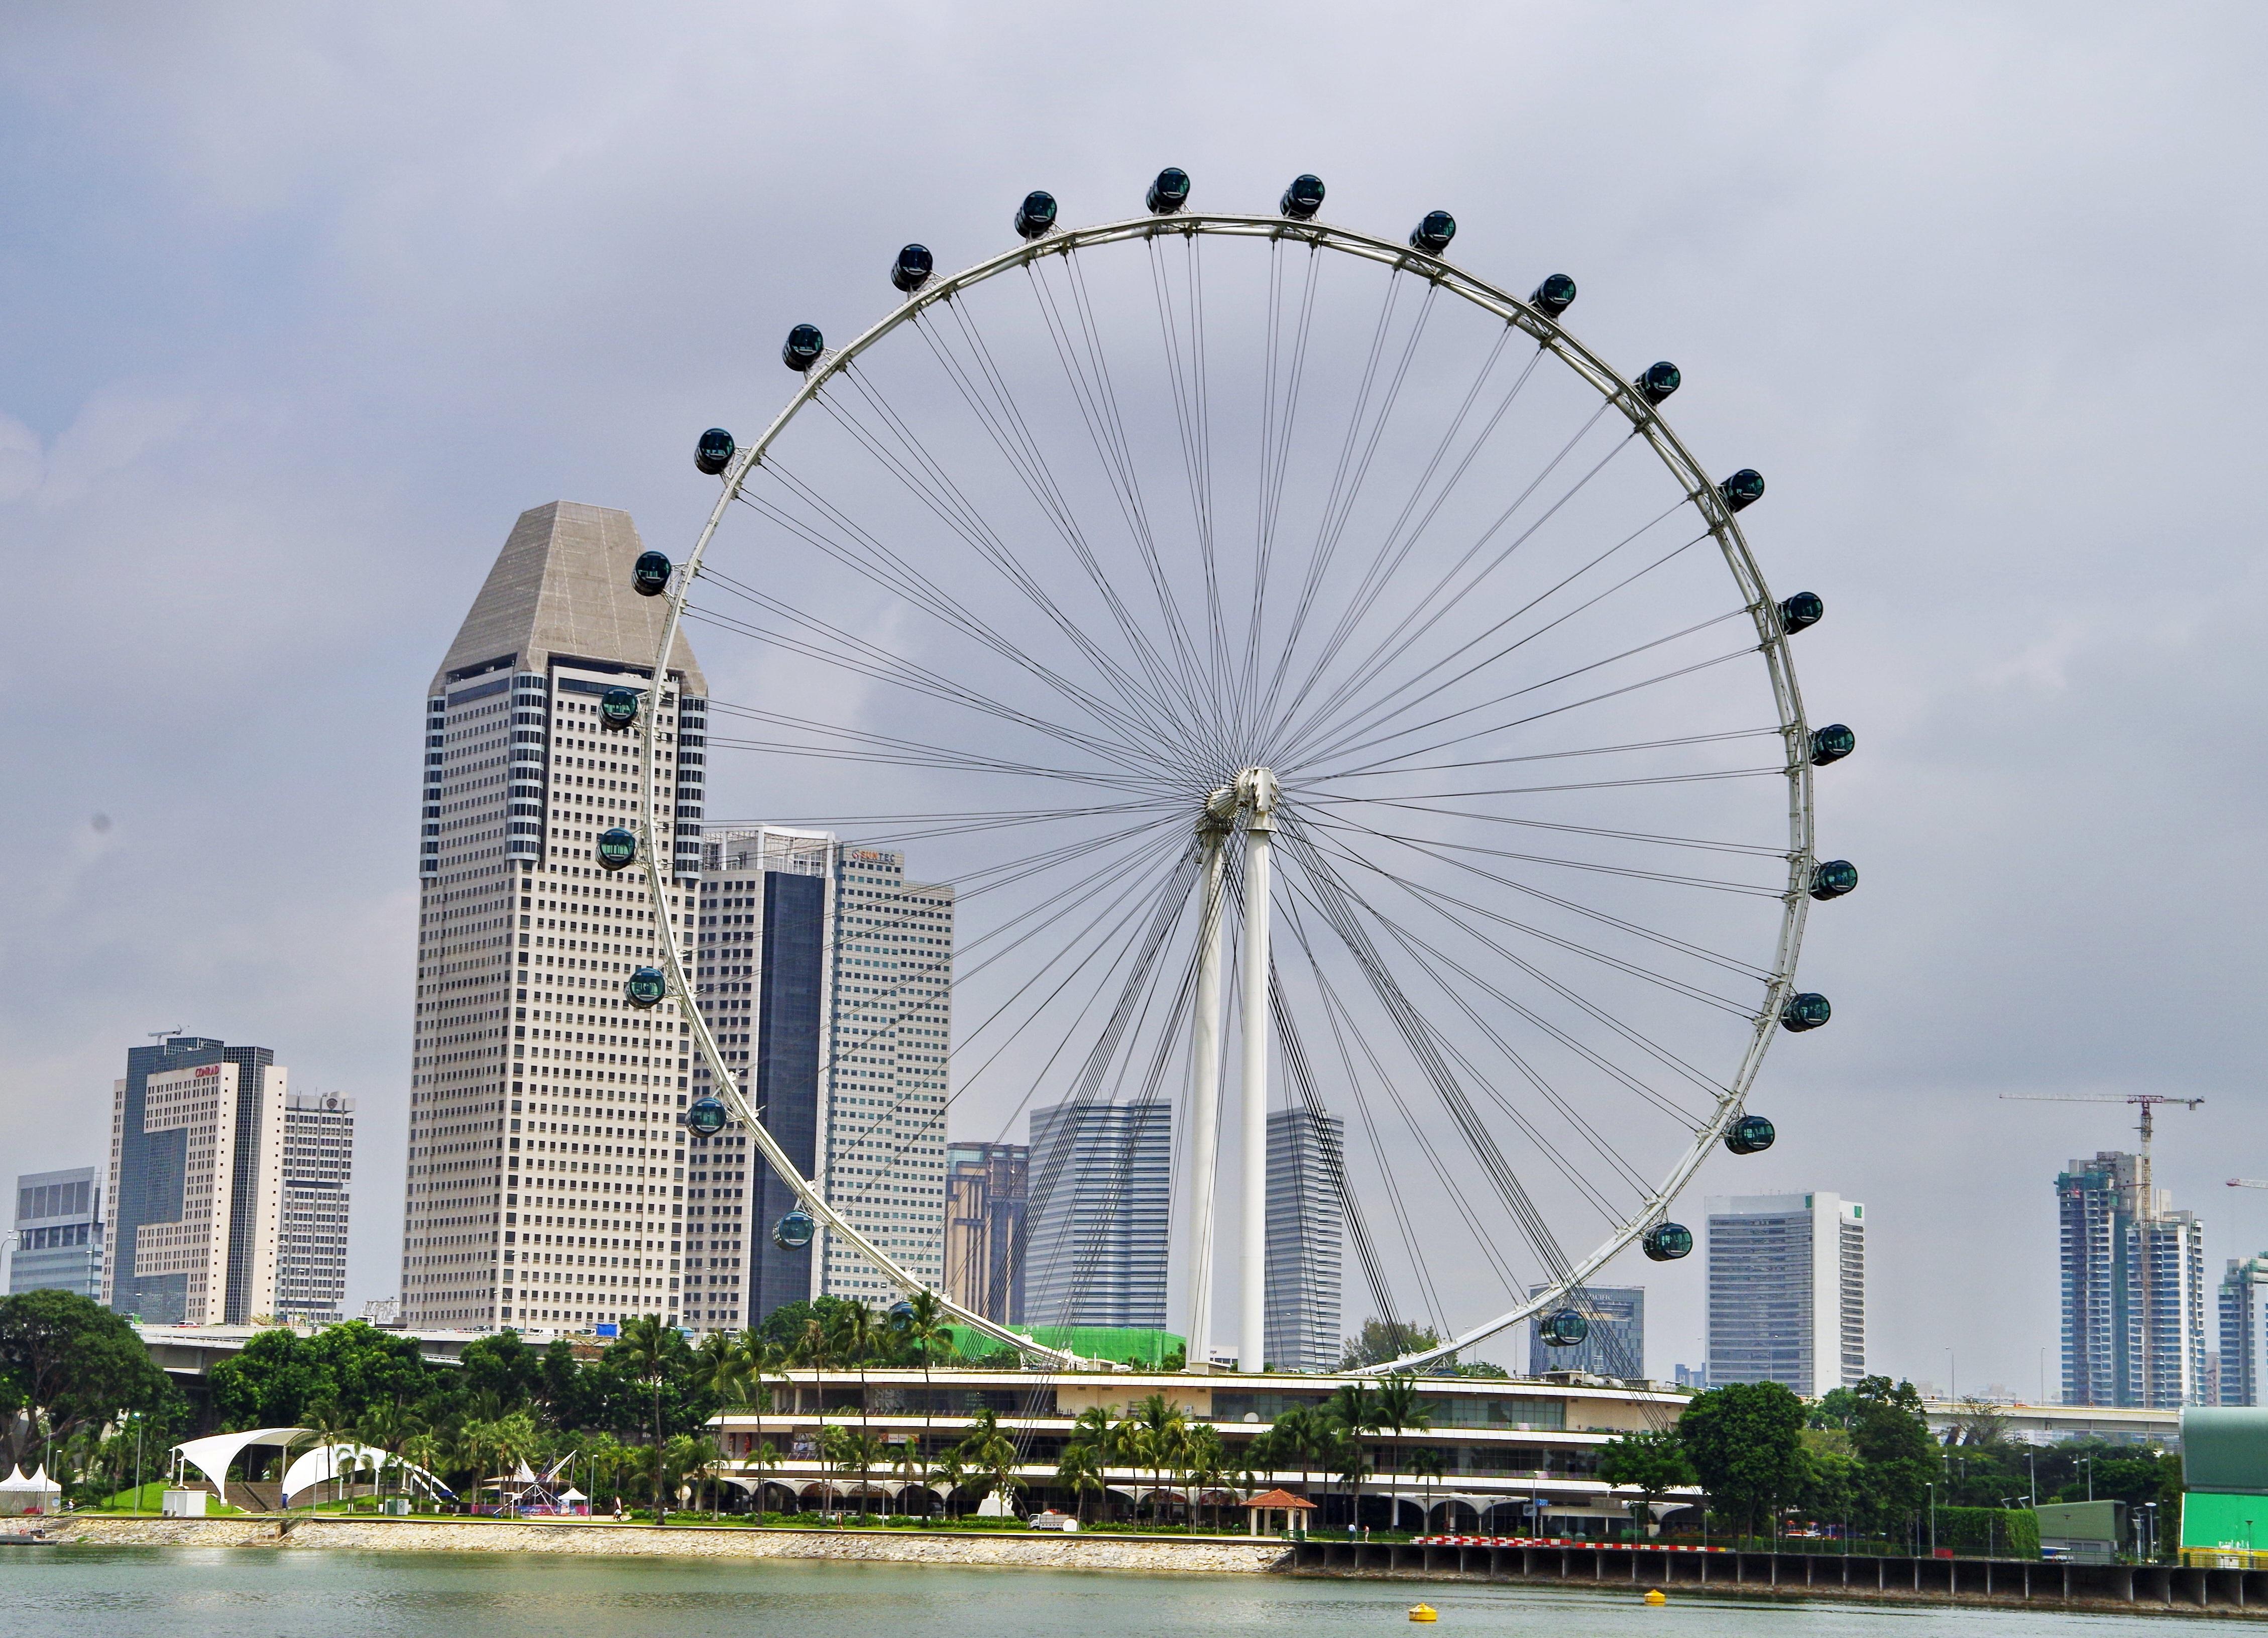 33ec9bba61d Сингапурско фериботно колело, Сингапур - Сингапур